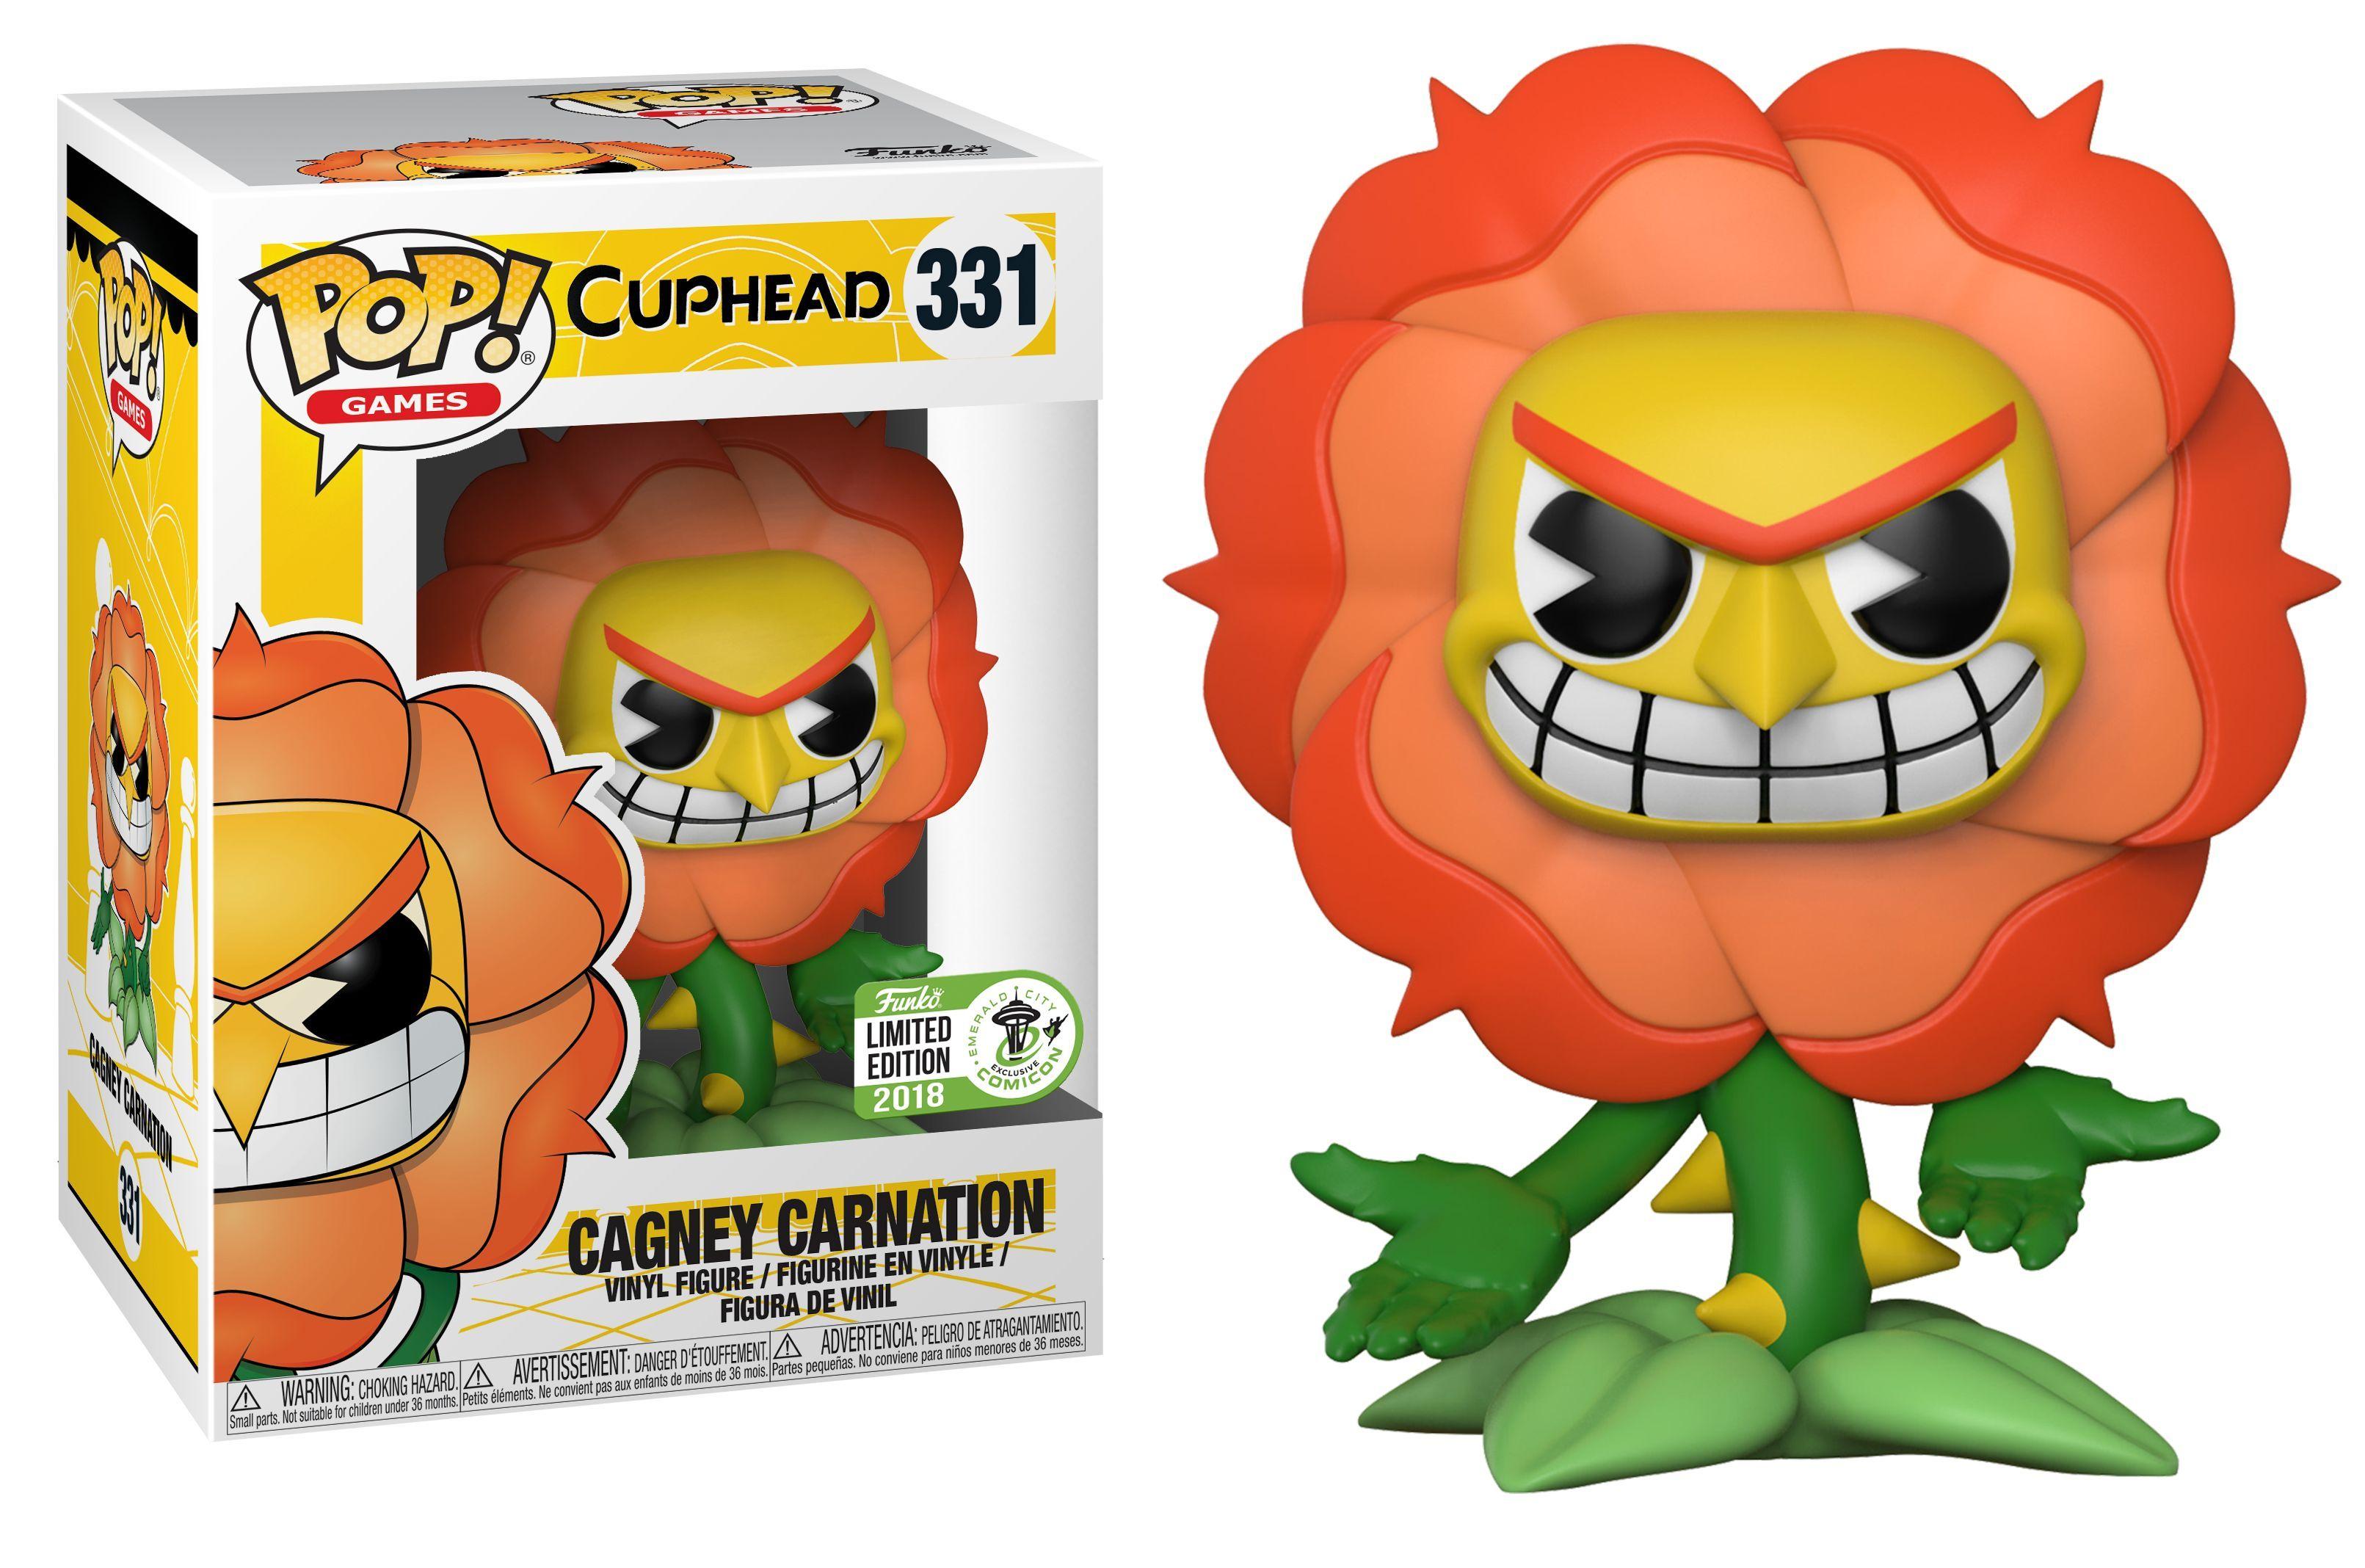 Eccc 2018 Cuphead Cagney Carnation Funko Pop 331 Jpg 3 222 2 136 Pixels Funko Pop Toys Funko Pop Pop Vinyl Figures